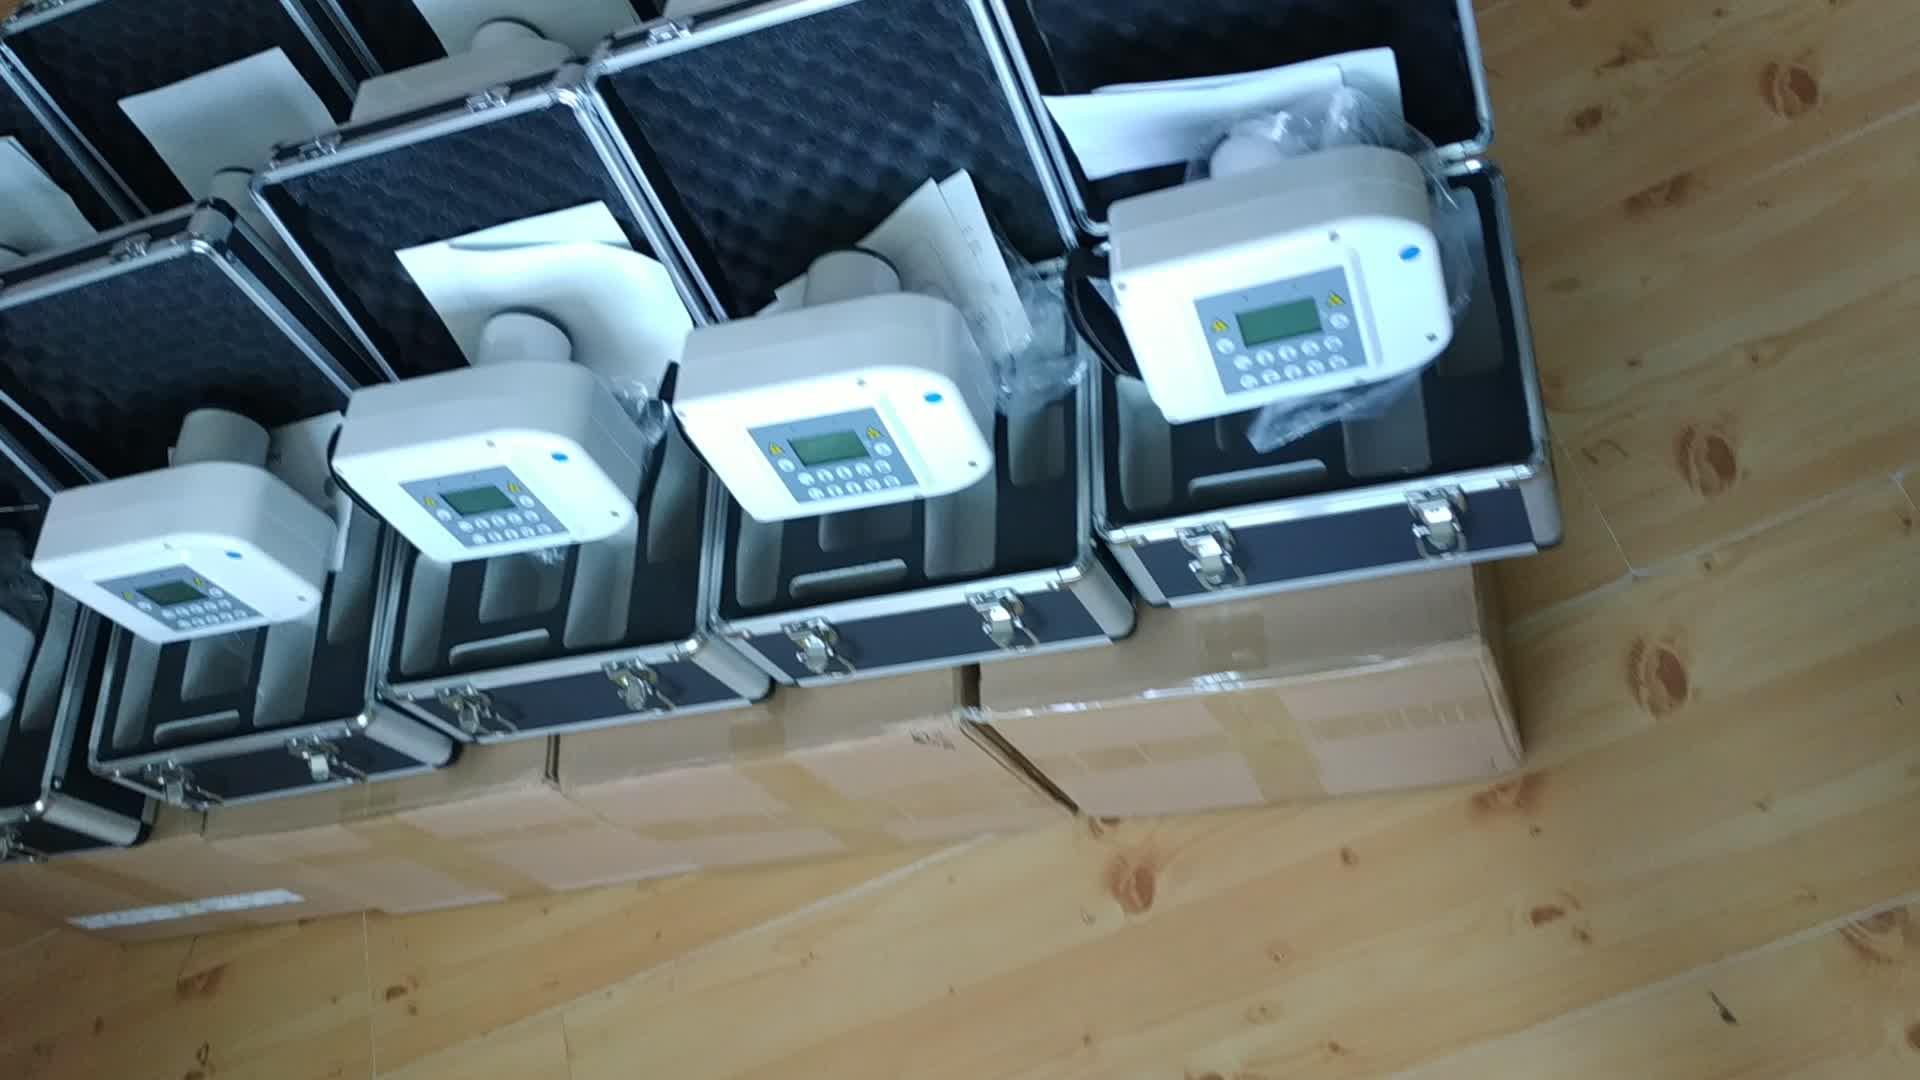 60Kv Power Dental Rvg Imaging Equipment Portable Digital Dental X-ray Unit